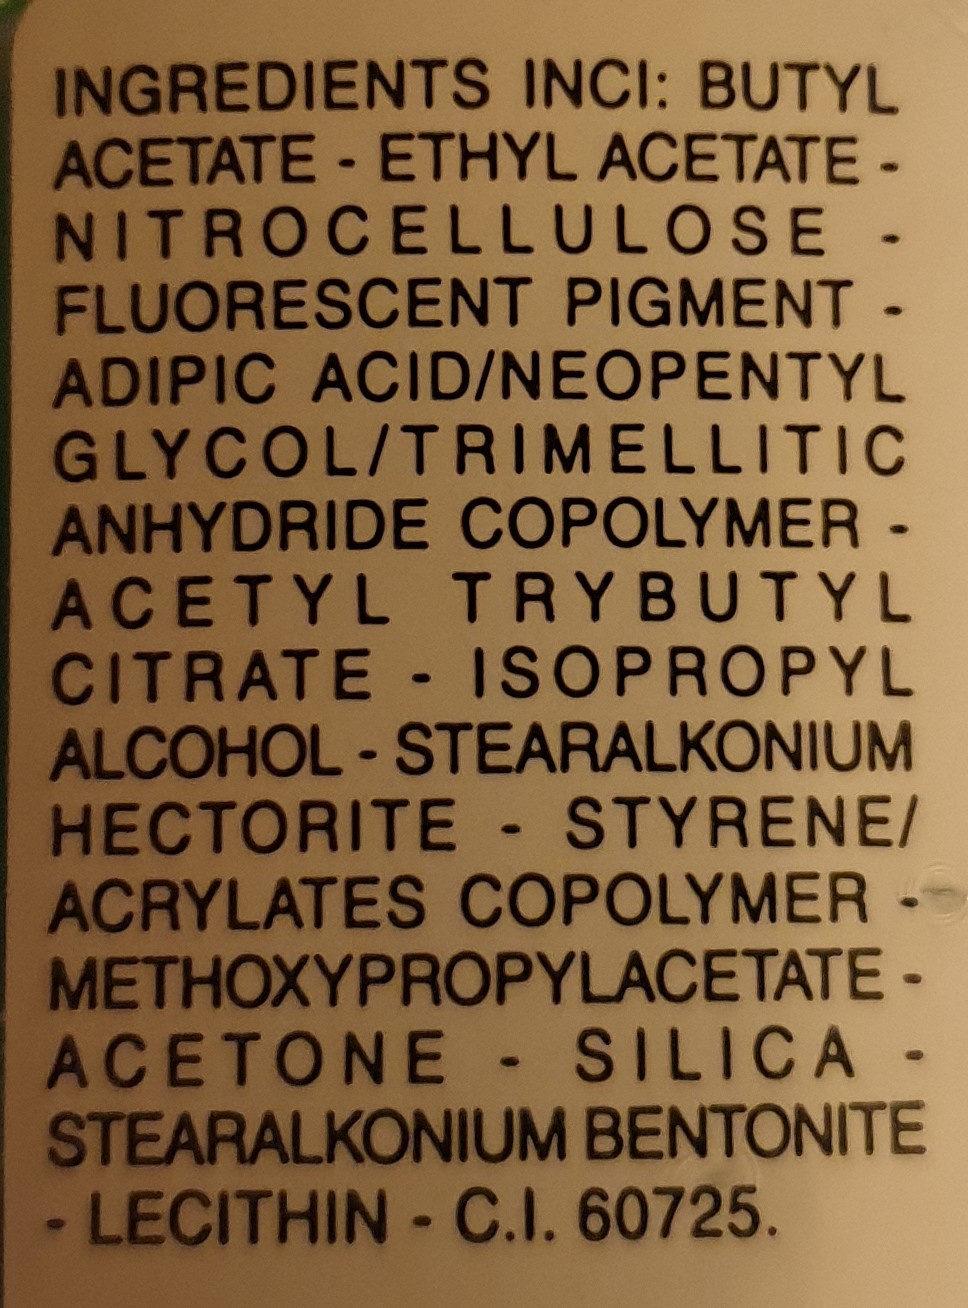 Neon nailpolish for artificial nails - Ingredients - de